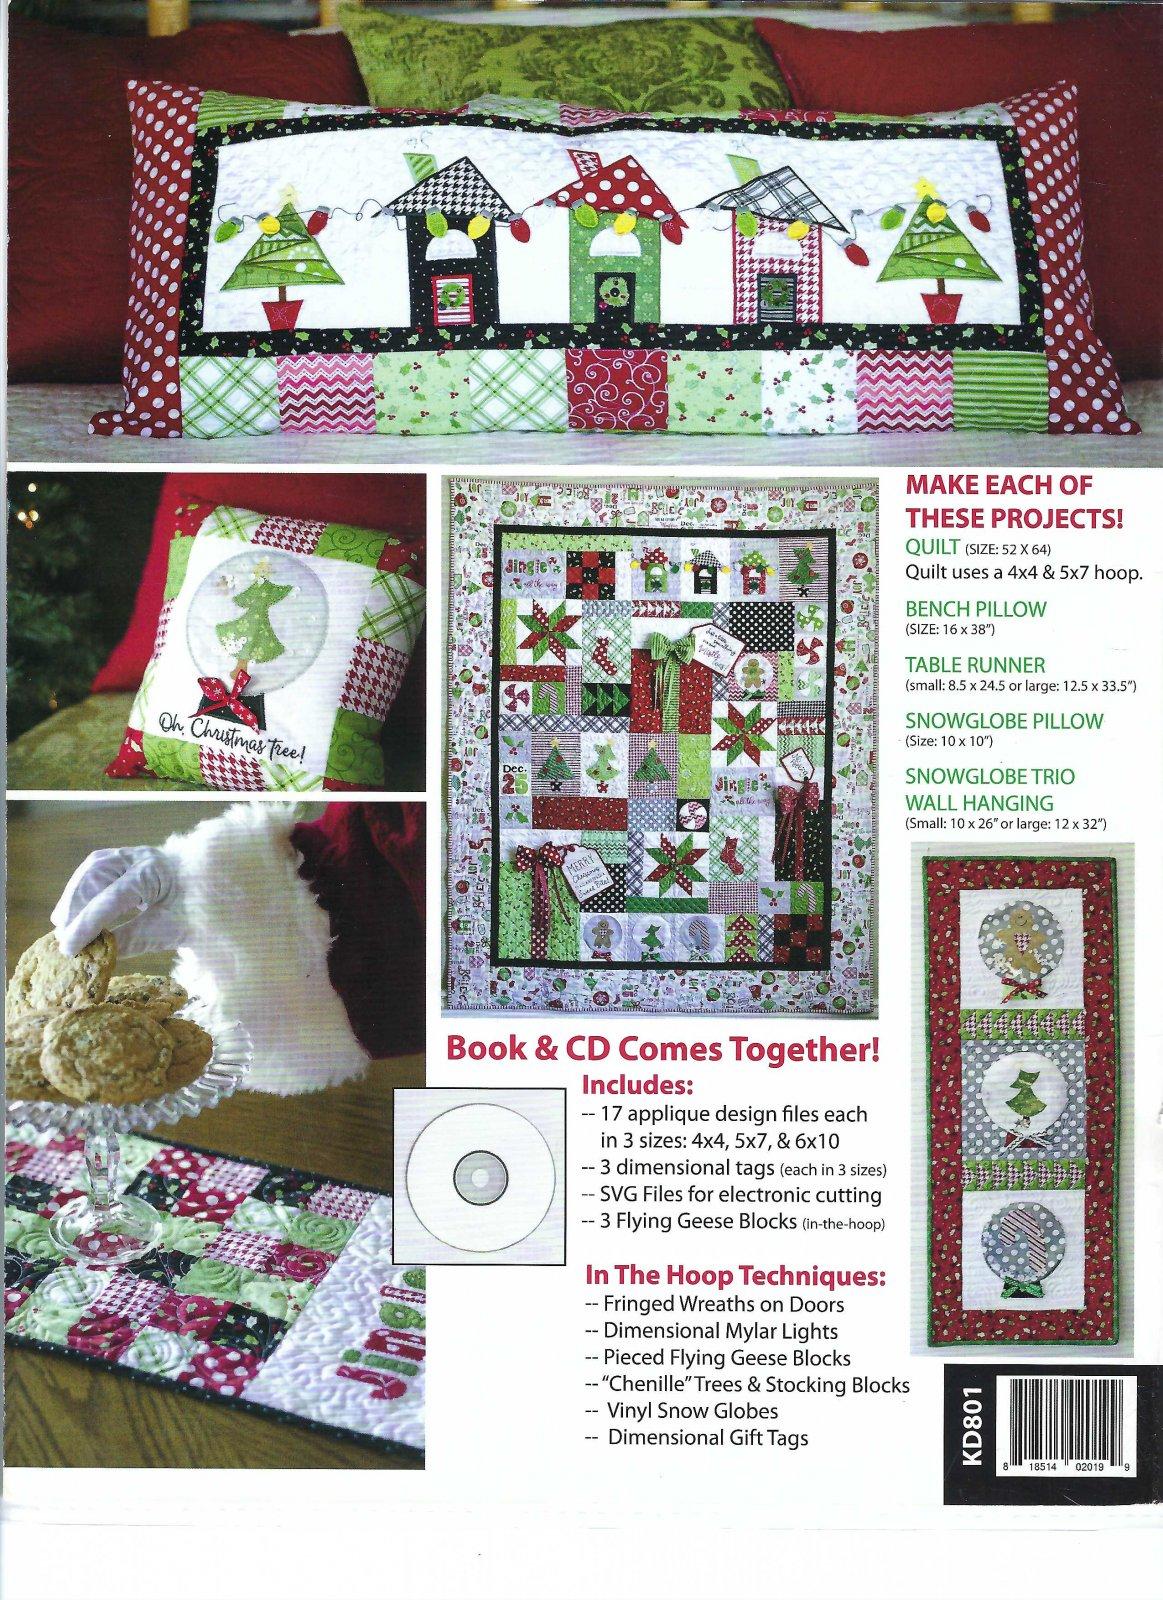 North Pole Neighborhood Bench Pillow Fabric Kit